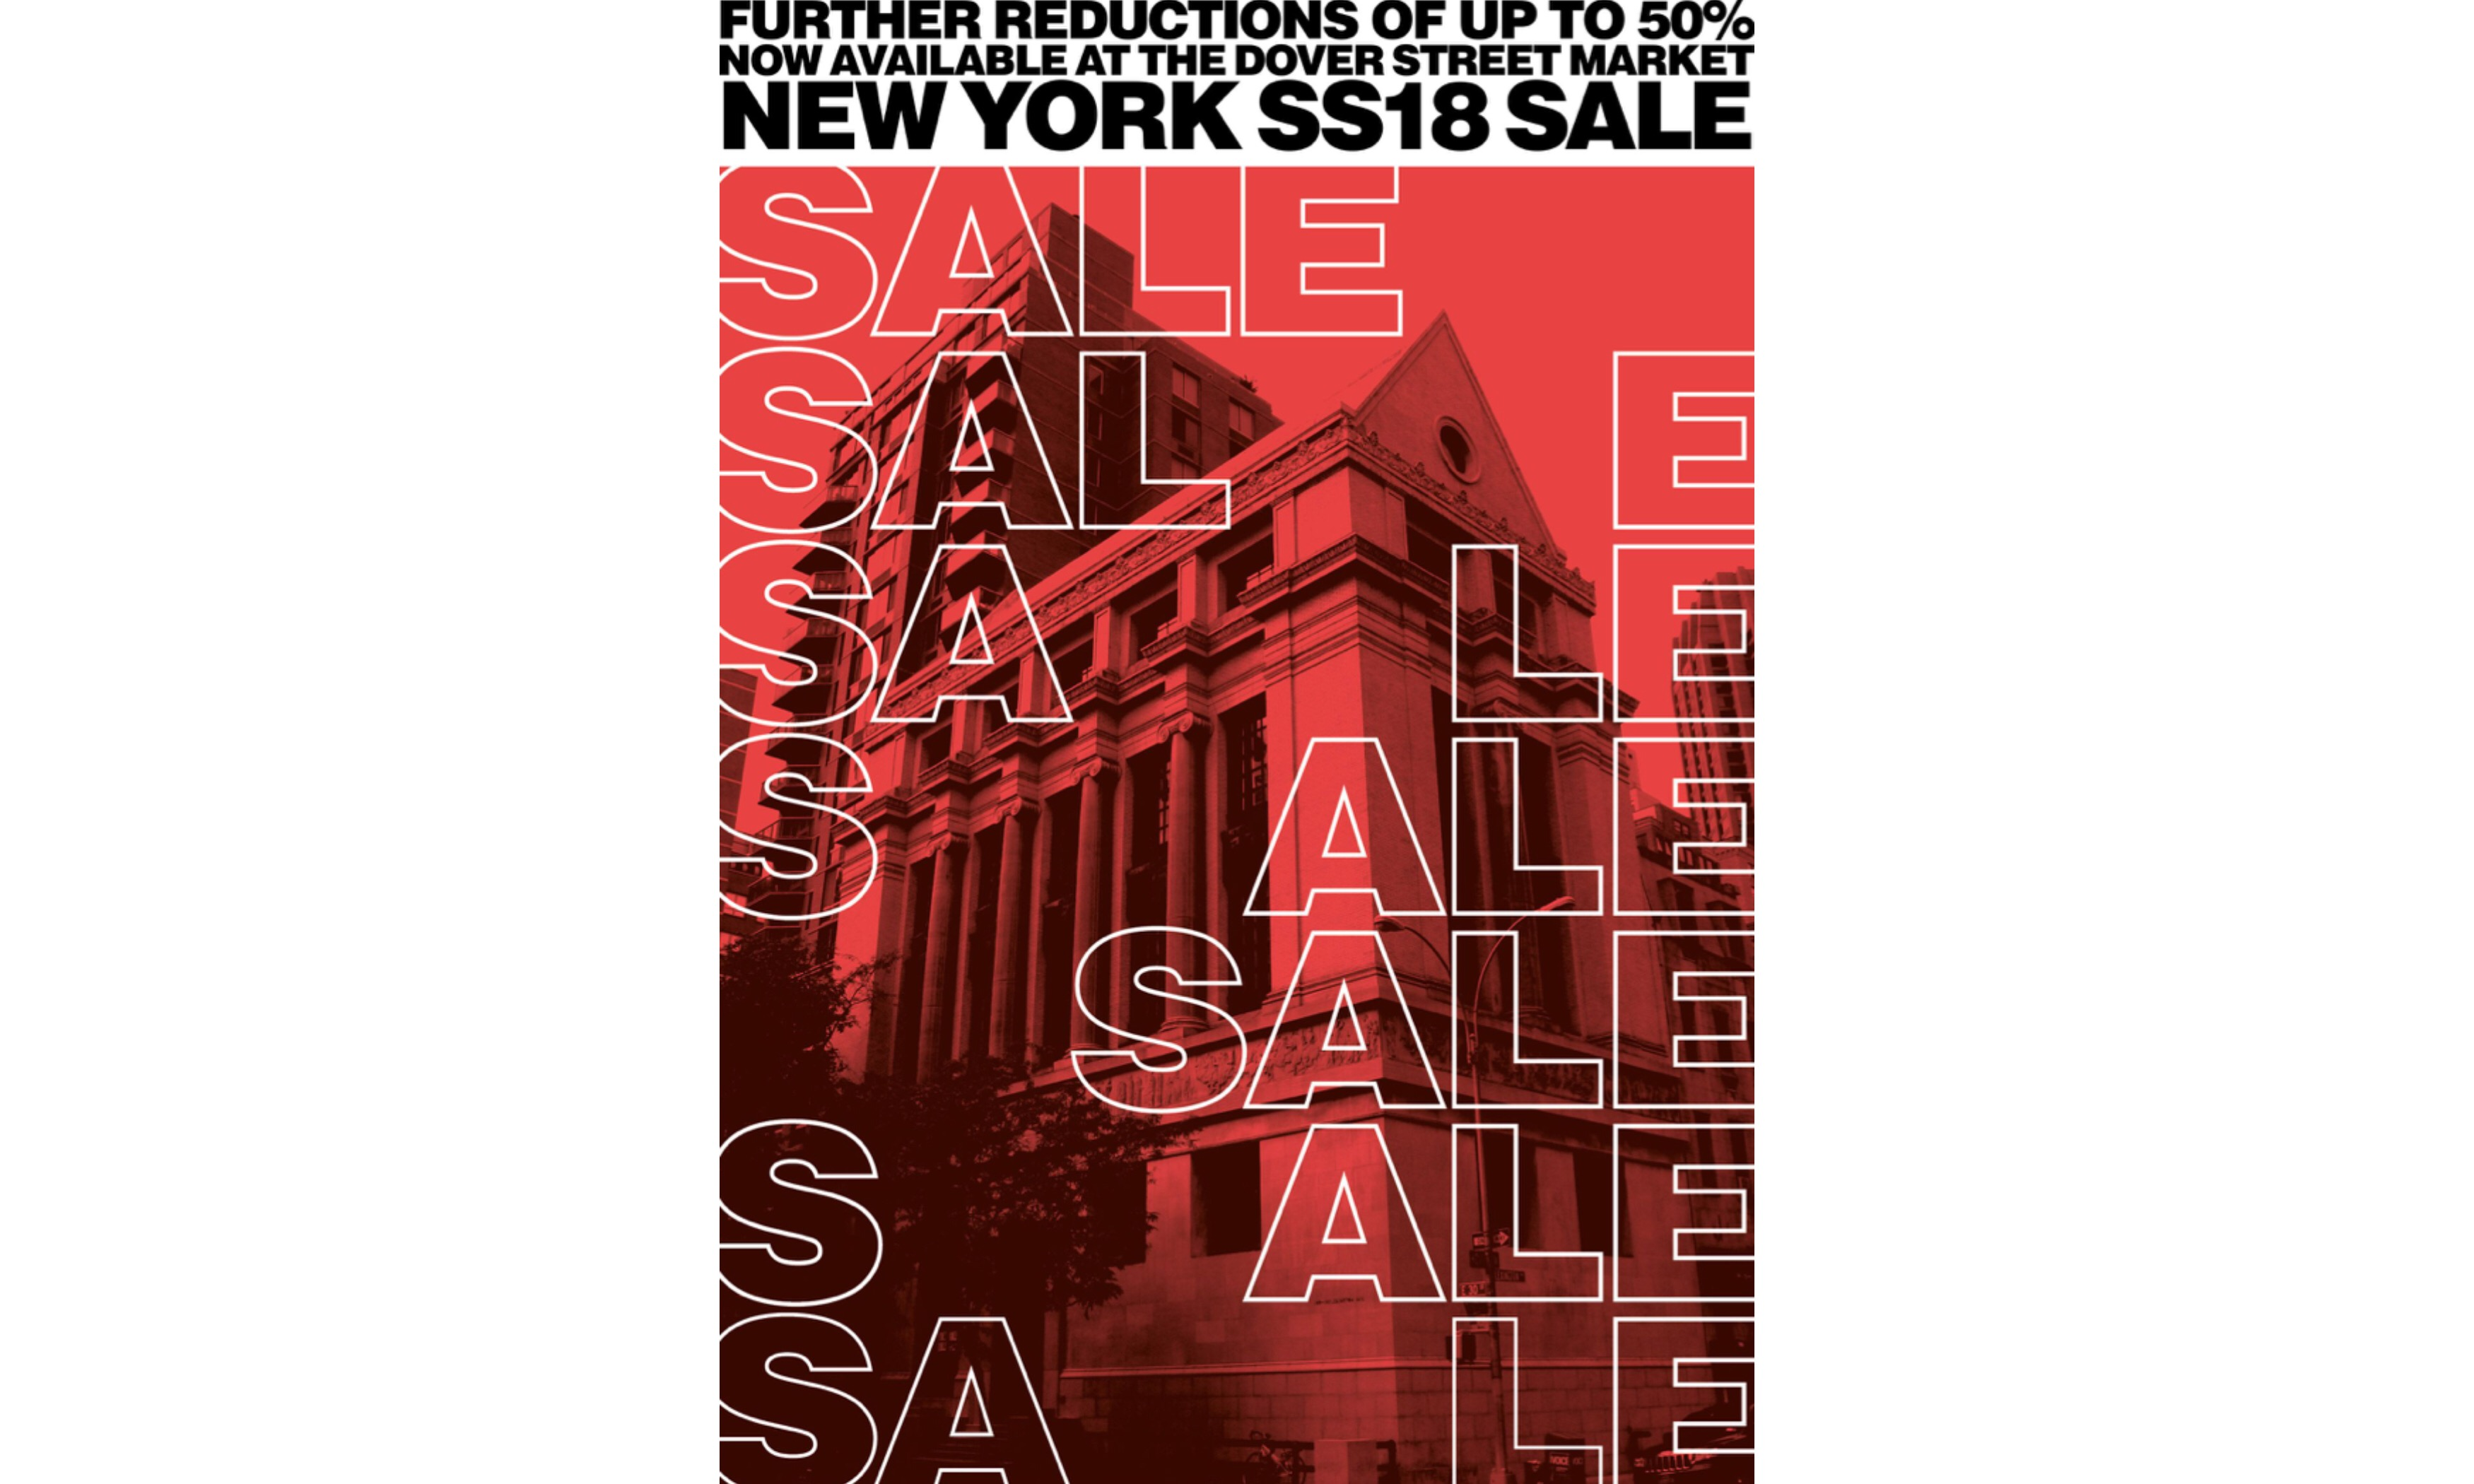 Dover Street Market New York 开启 18 春夏半价模式